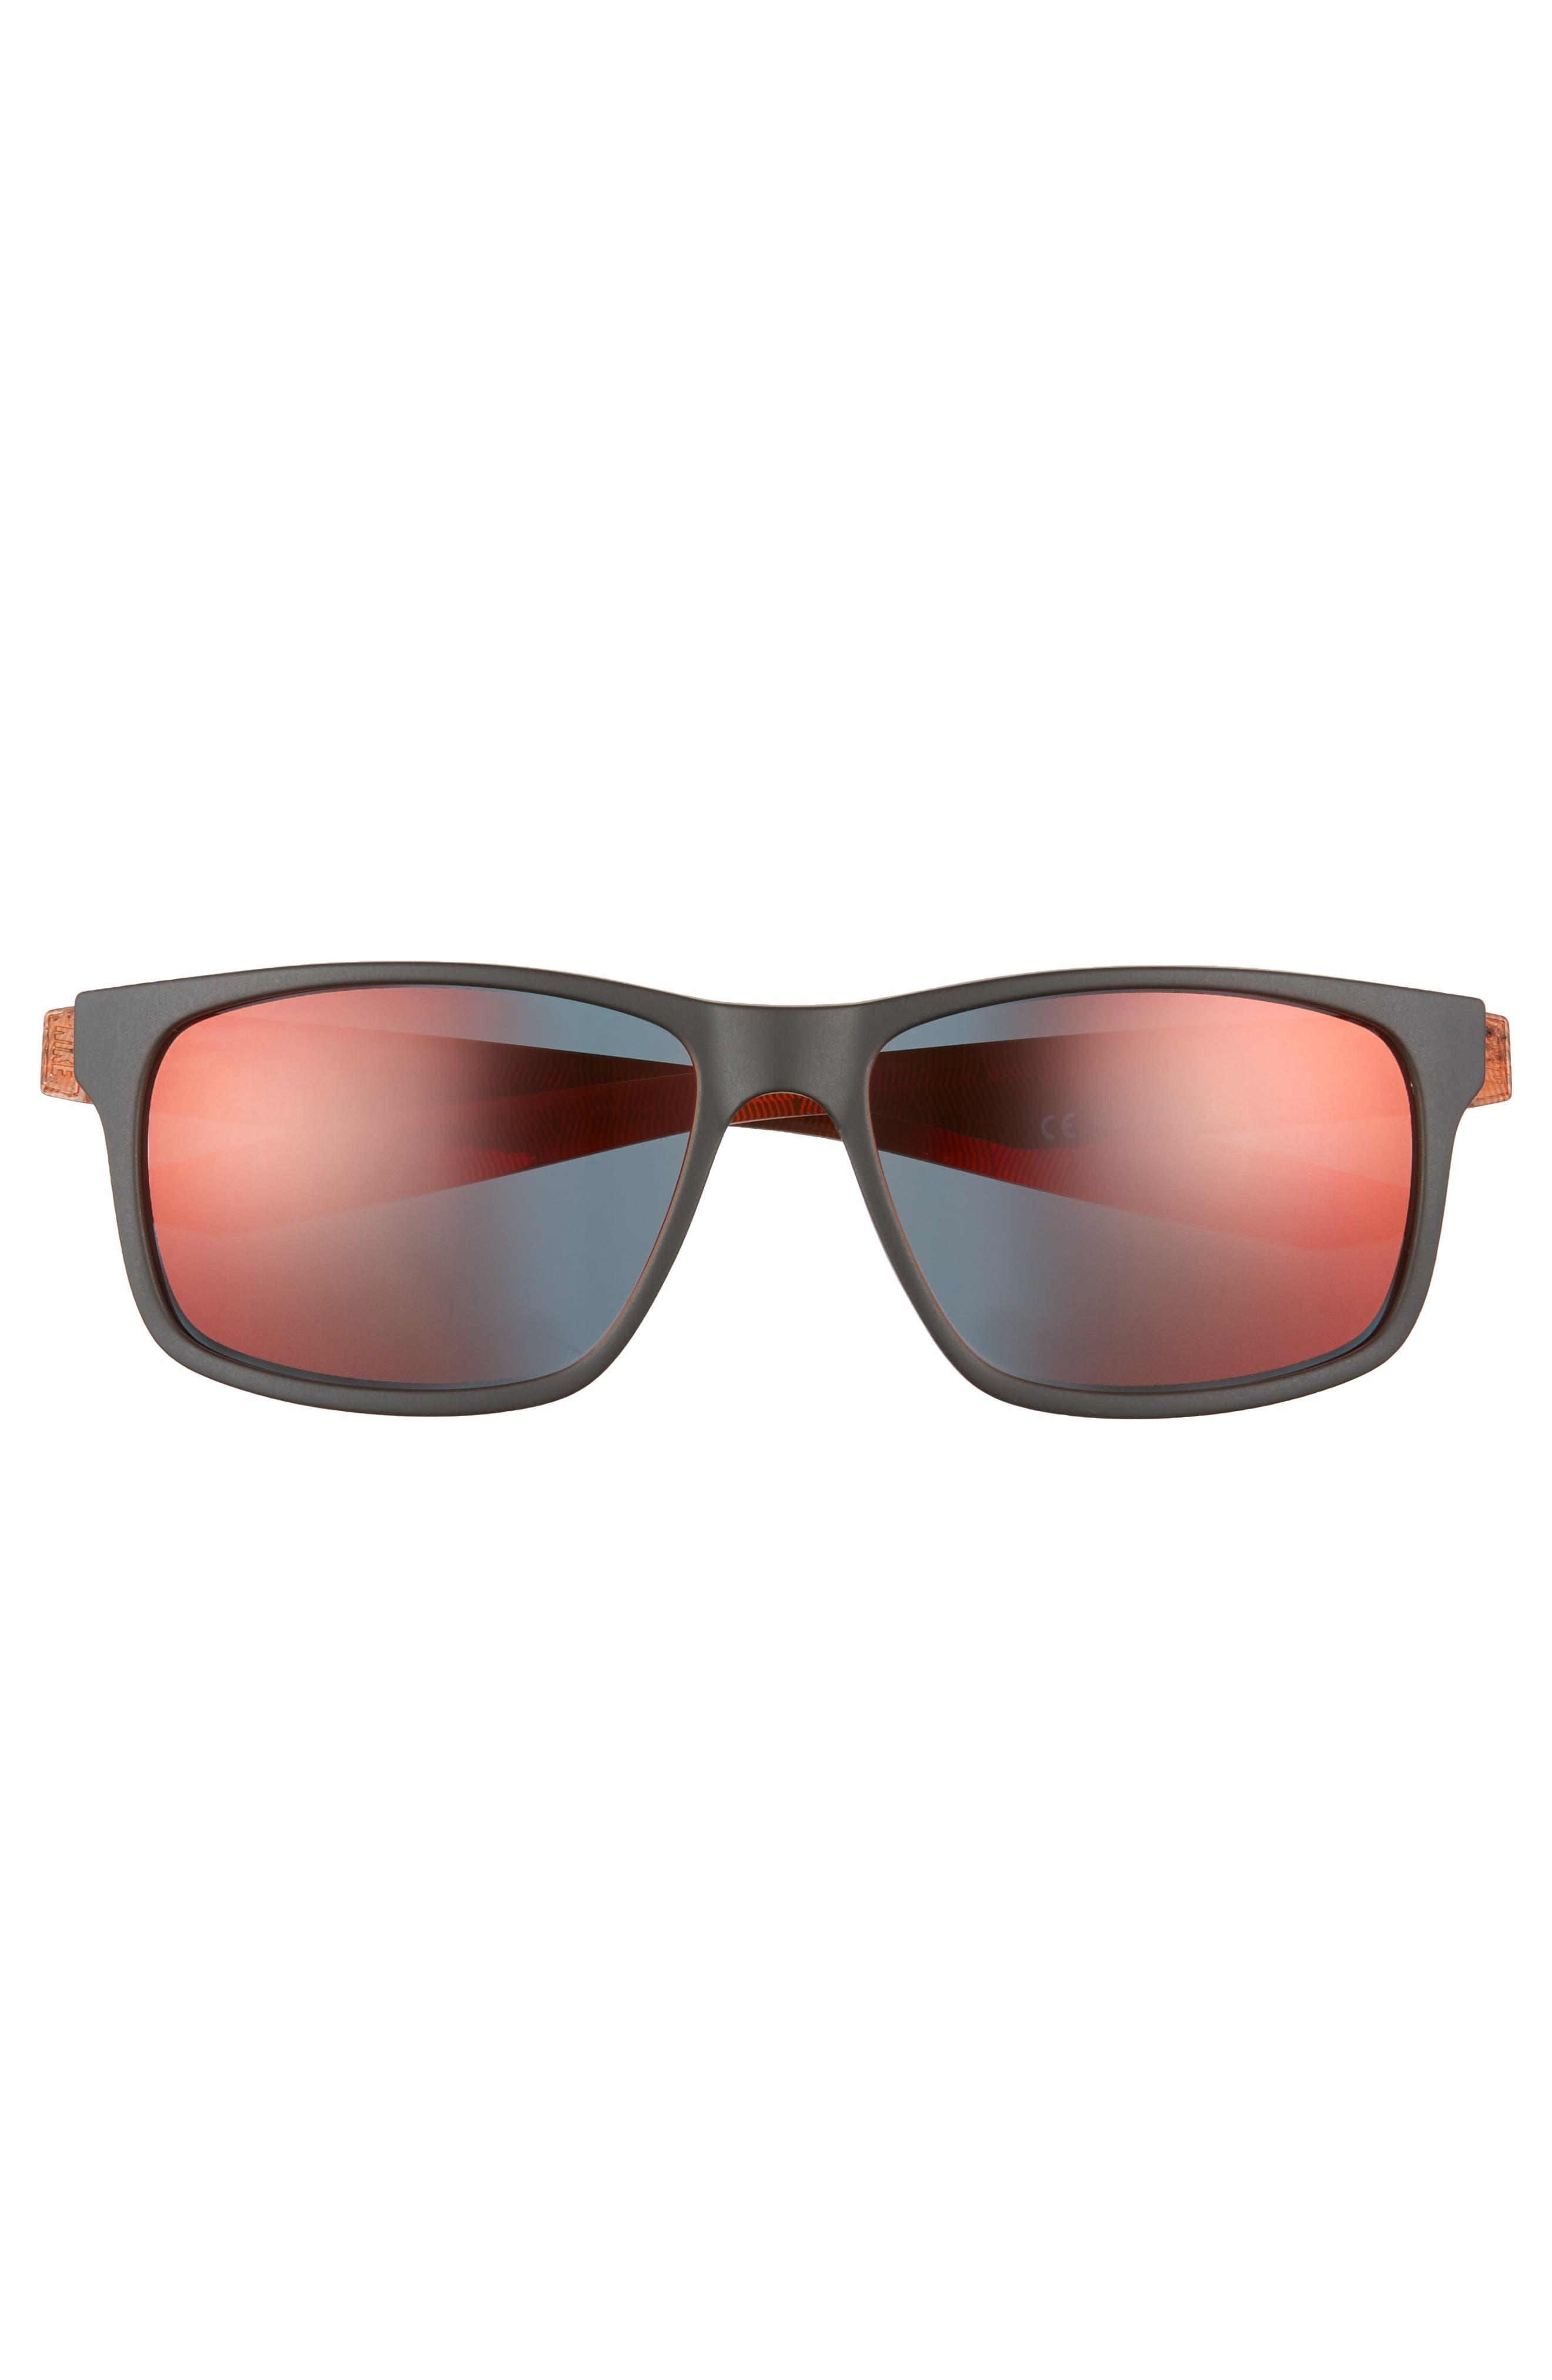 Essential Chaser 57mm Reflective Sunglasses,                             Alternate thumbnail 2, color,                             Matte Black/ Amaranthine